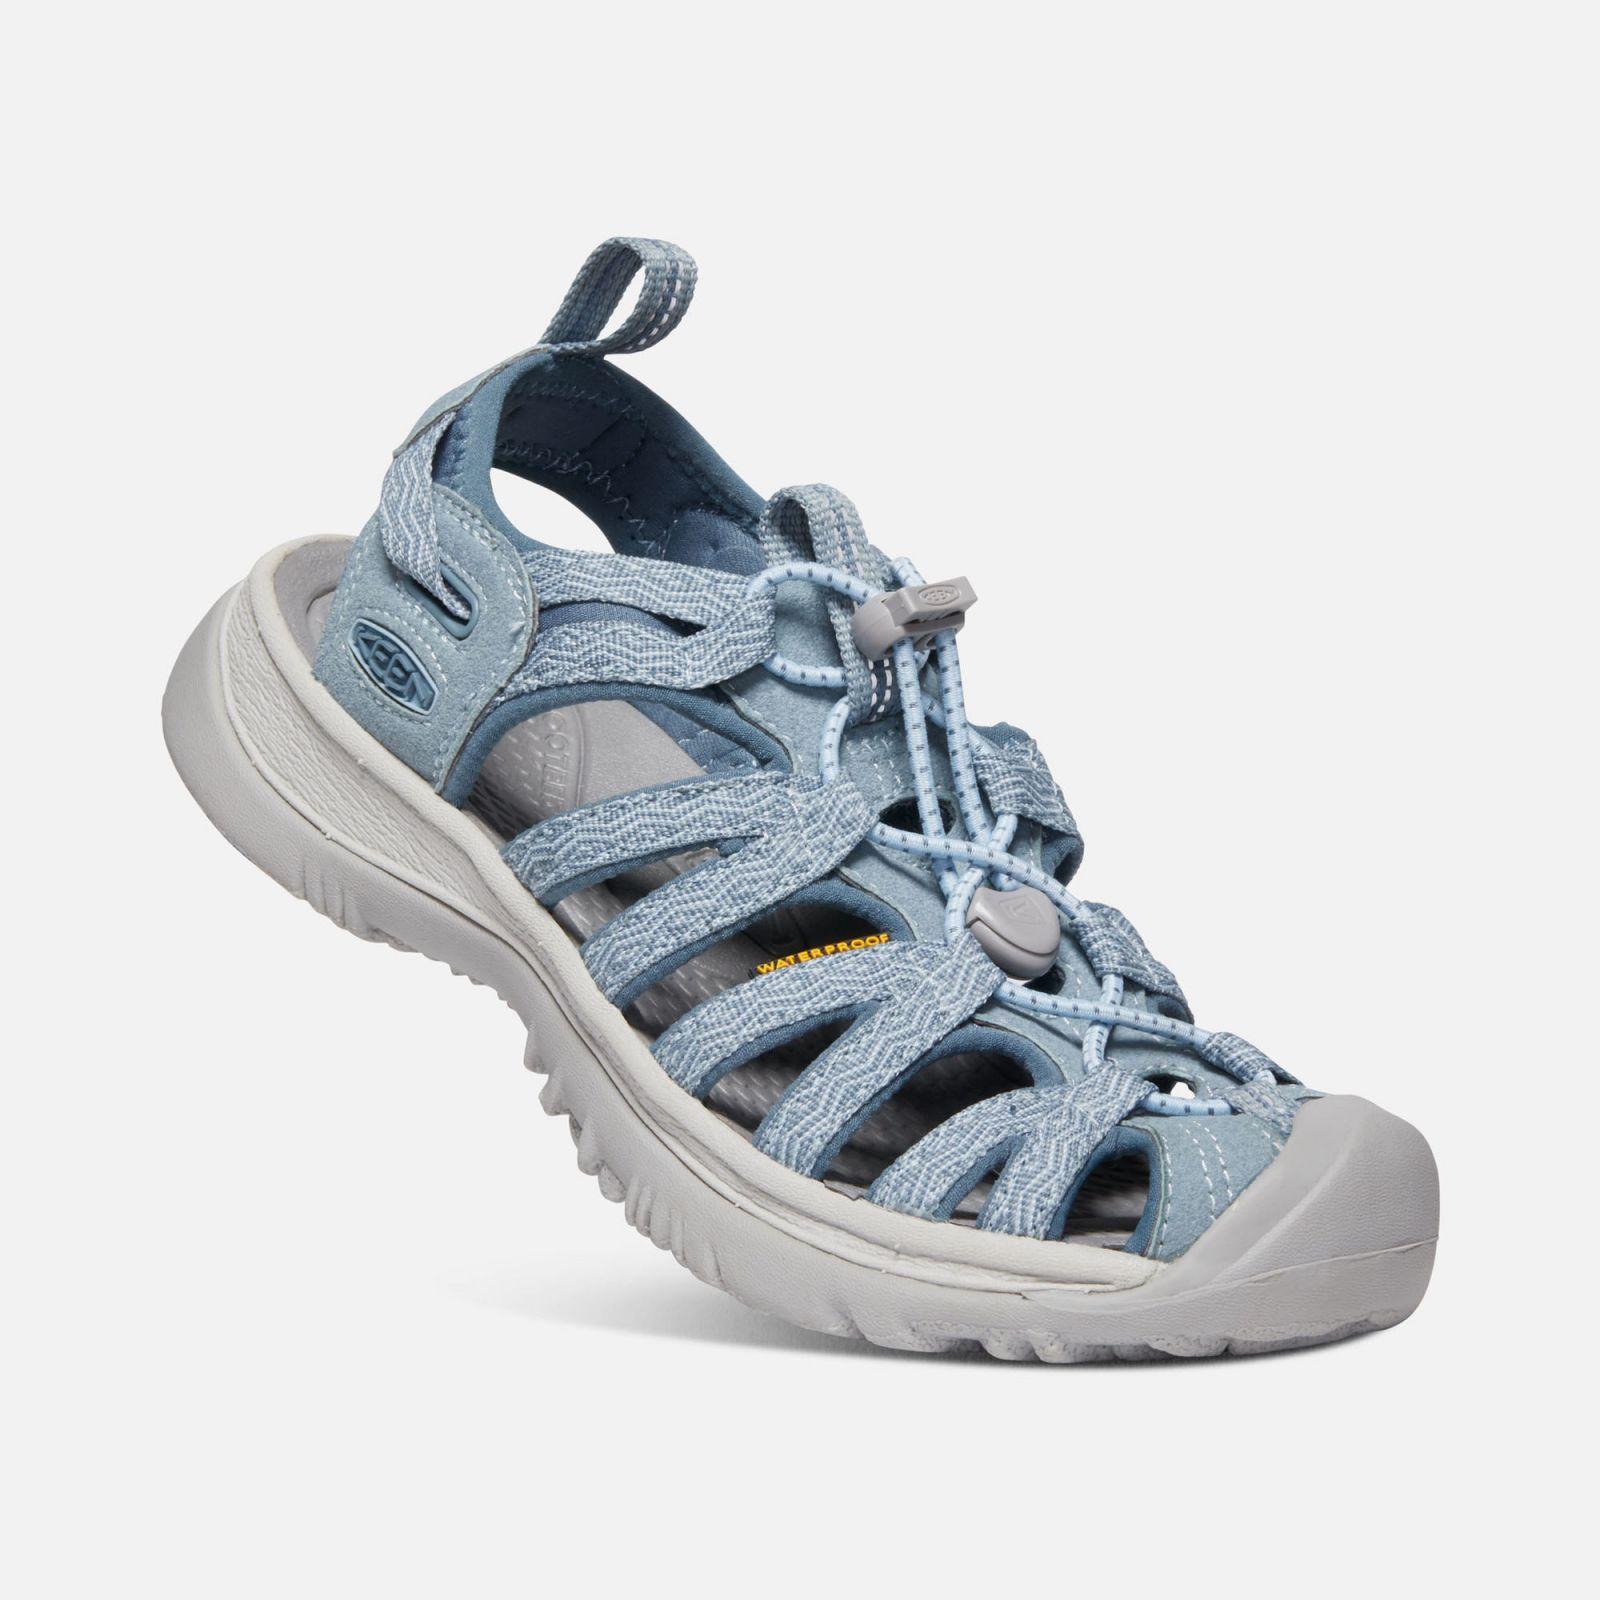 Tazz-Sport - KEEN Whisper W Citadel / Blue mirage dámský sandál